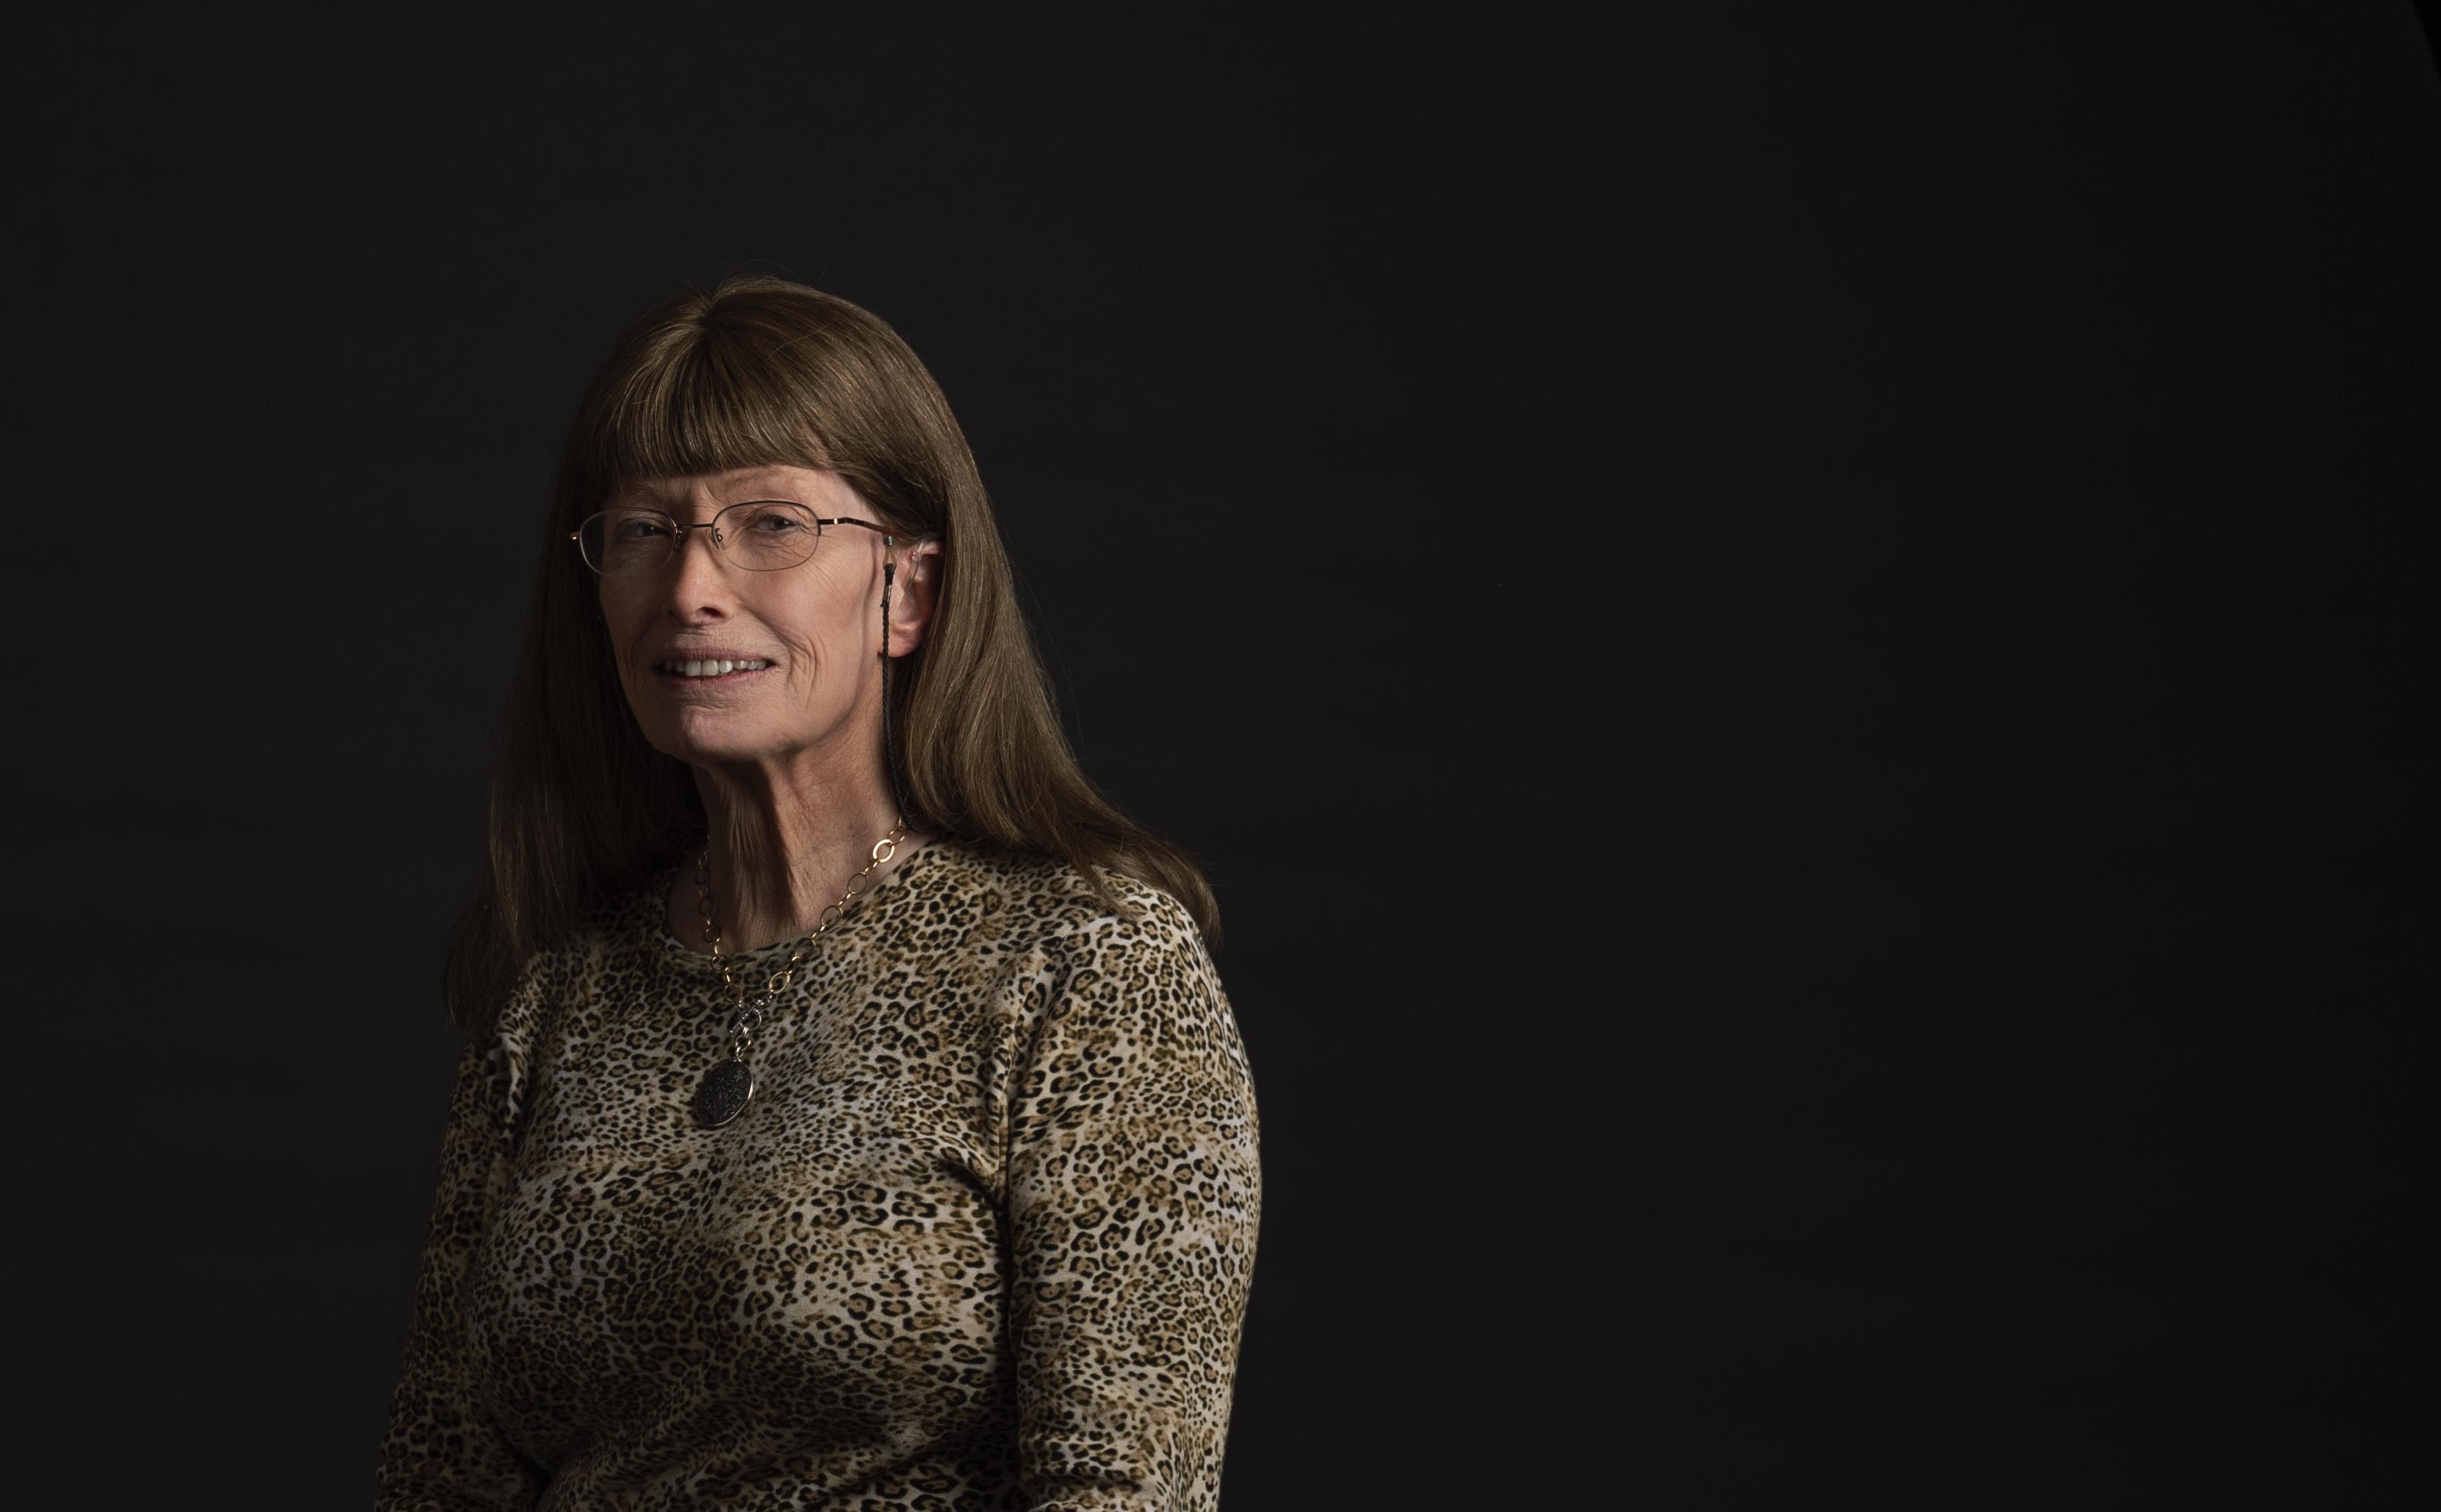 Lynn Conway portrait on March 26, 2019 at Syracuse University